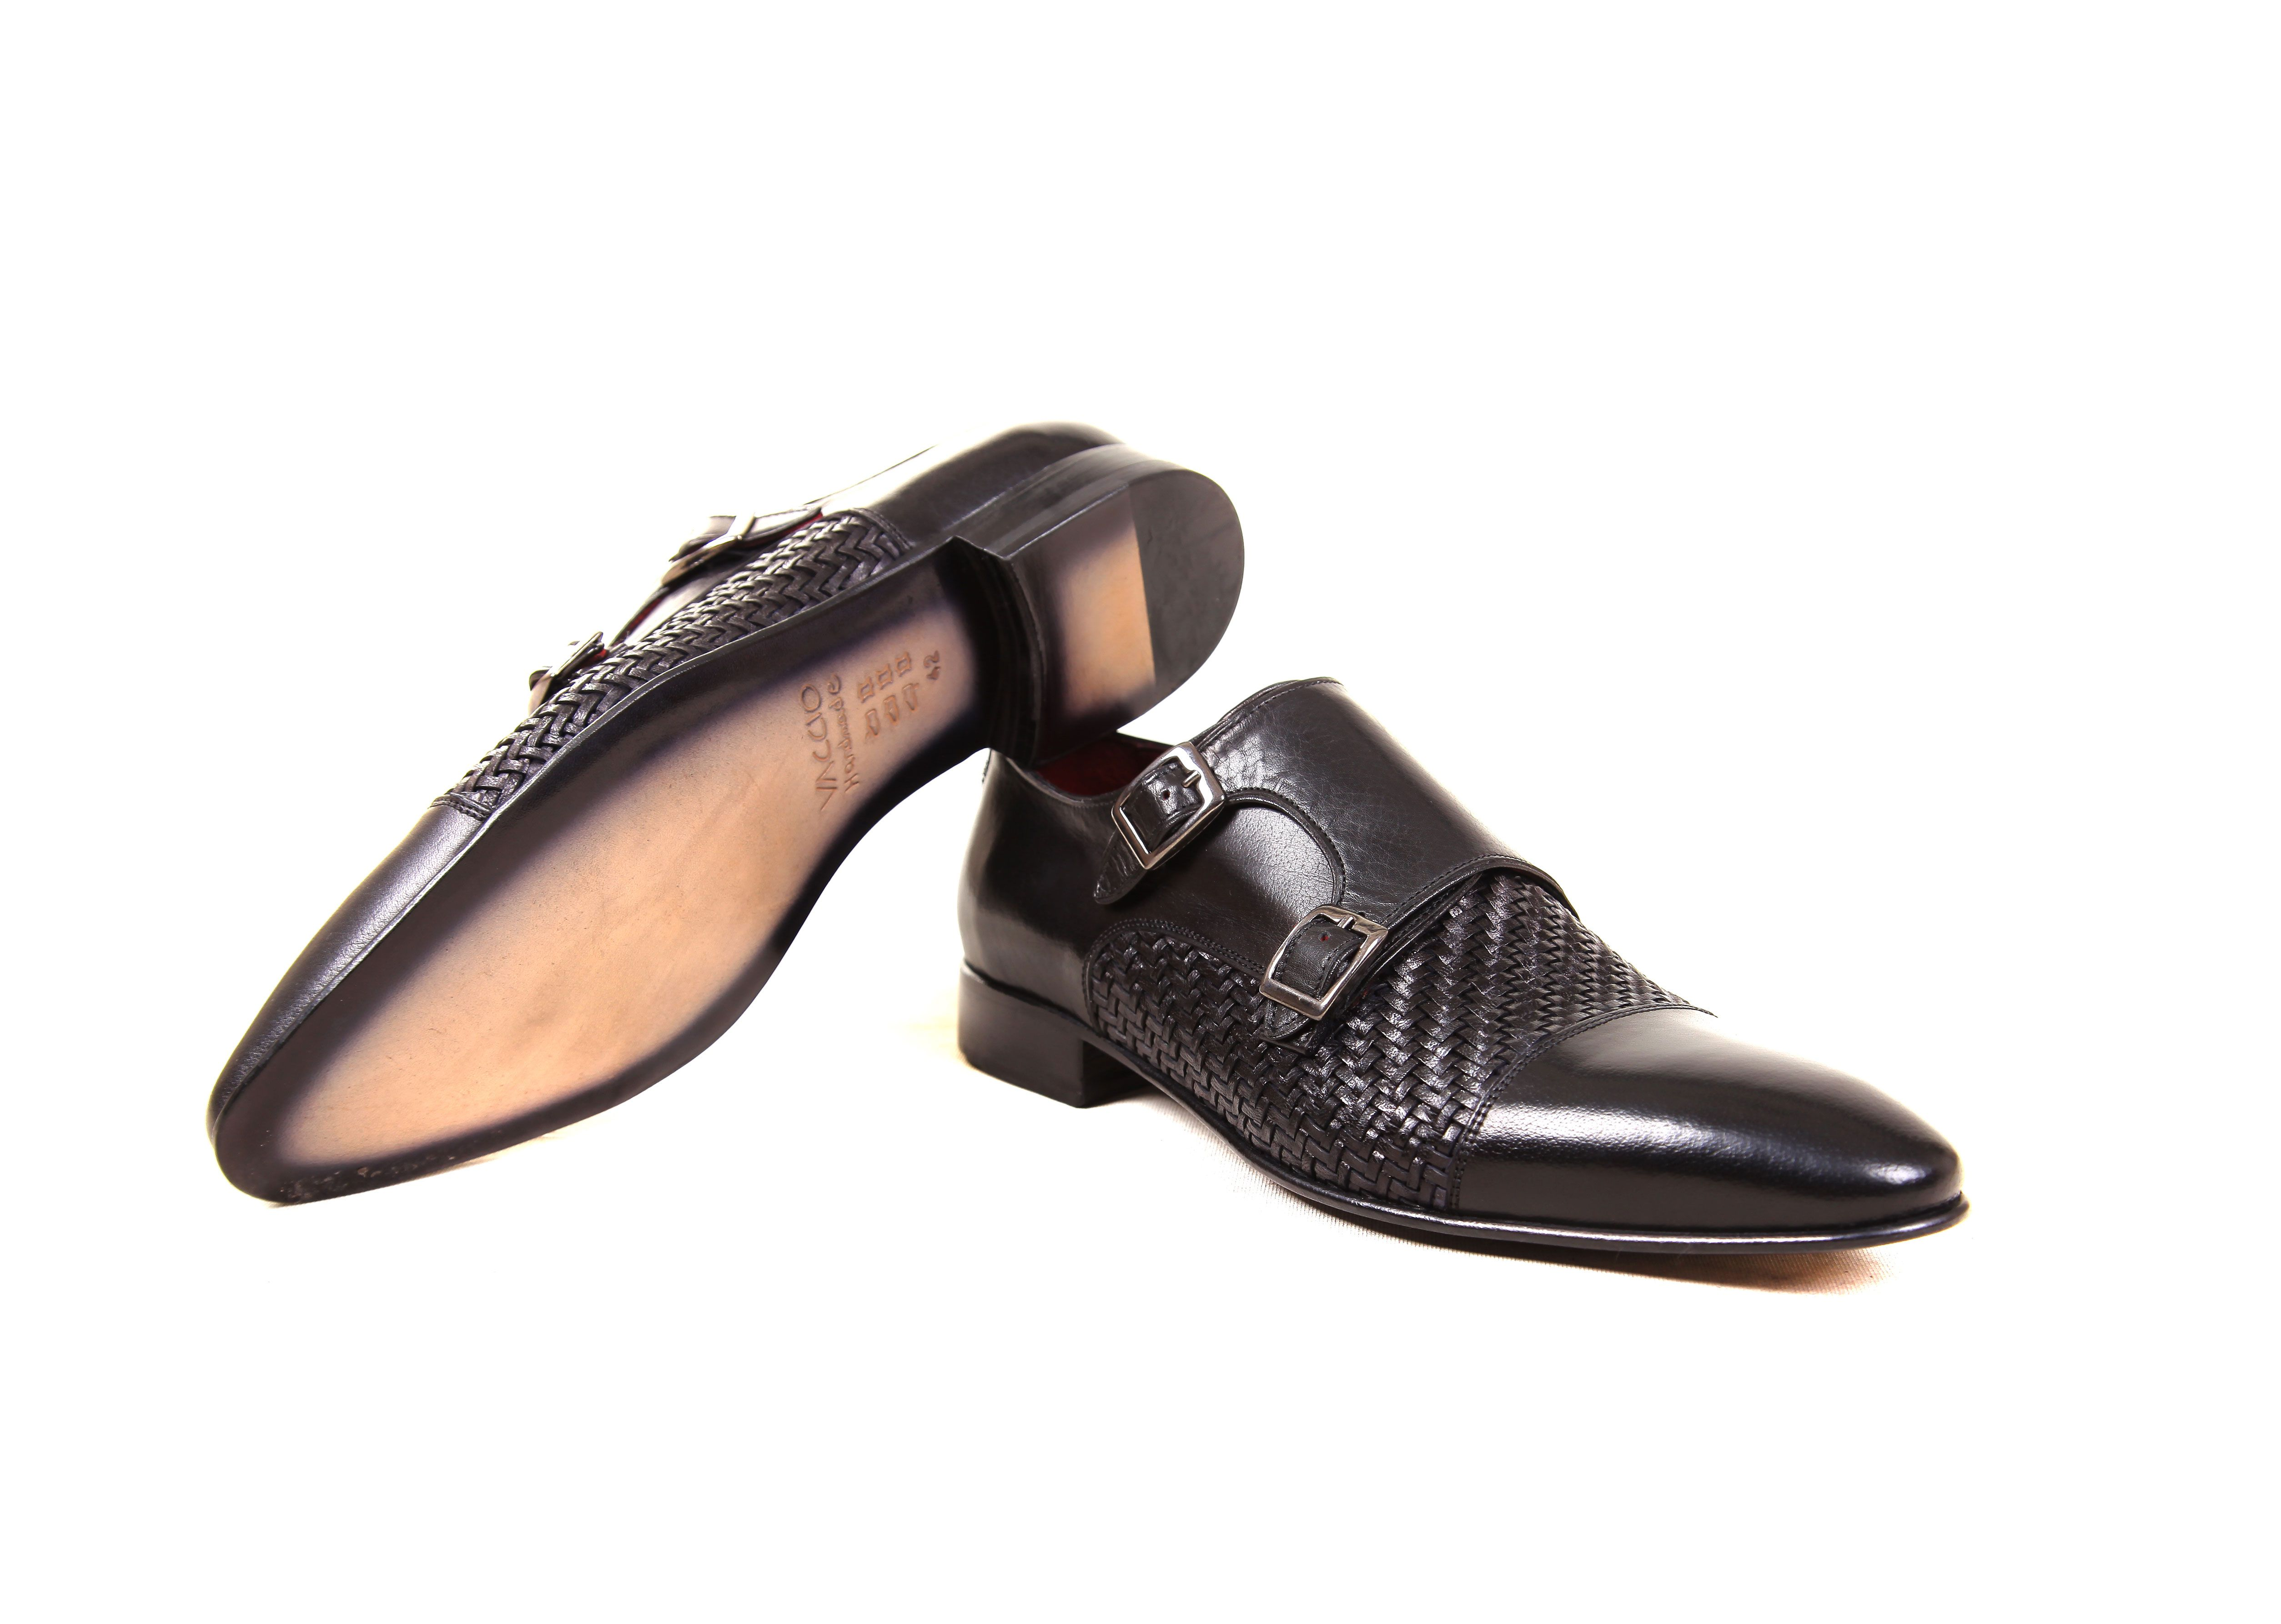 b81382be9e67 HandmadeShoes  Splendore Black. Details   Leather Double-Monk Strap ...